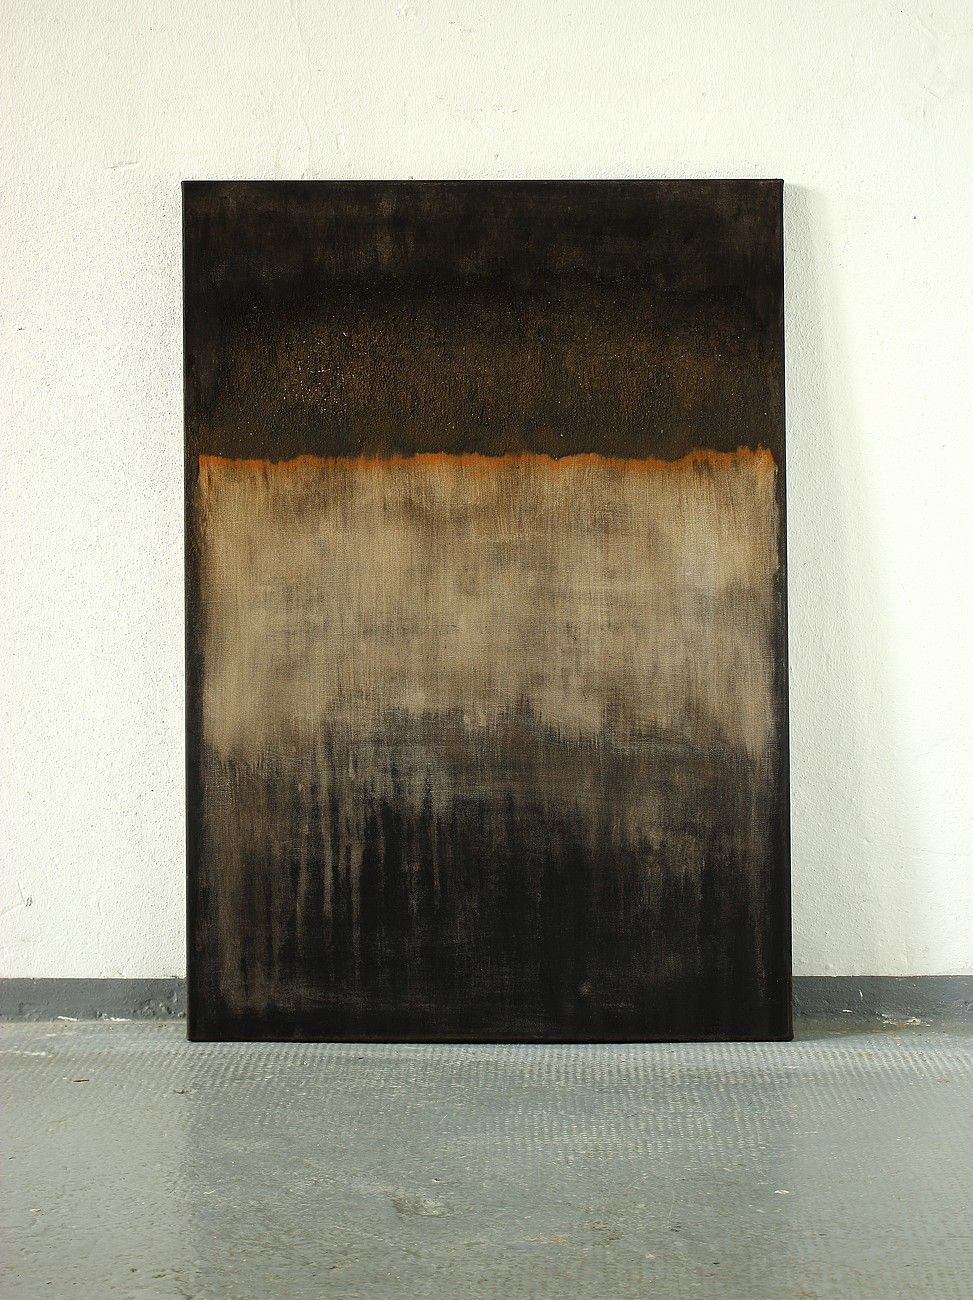 201 7 - 1 00 x 70 cm - Mischtechnik auf Leinwand ,abstrakte, Kunst, malerei, Lei...  #abstrakte #ContemporaryArt #kunst #leinwand #malerei #mischtechnik